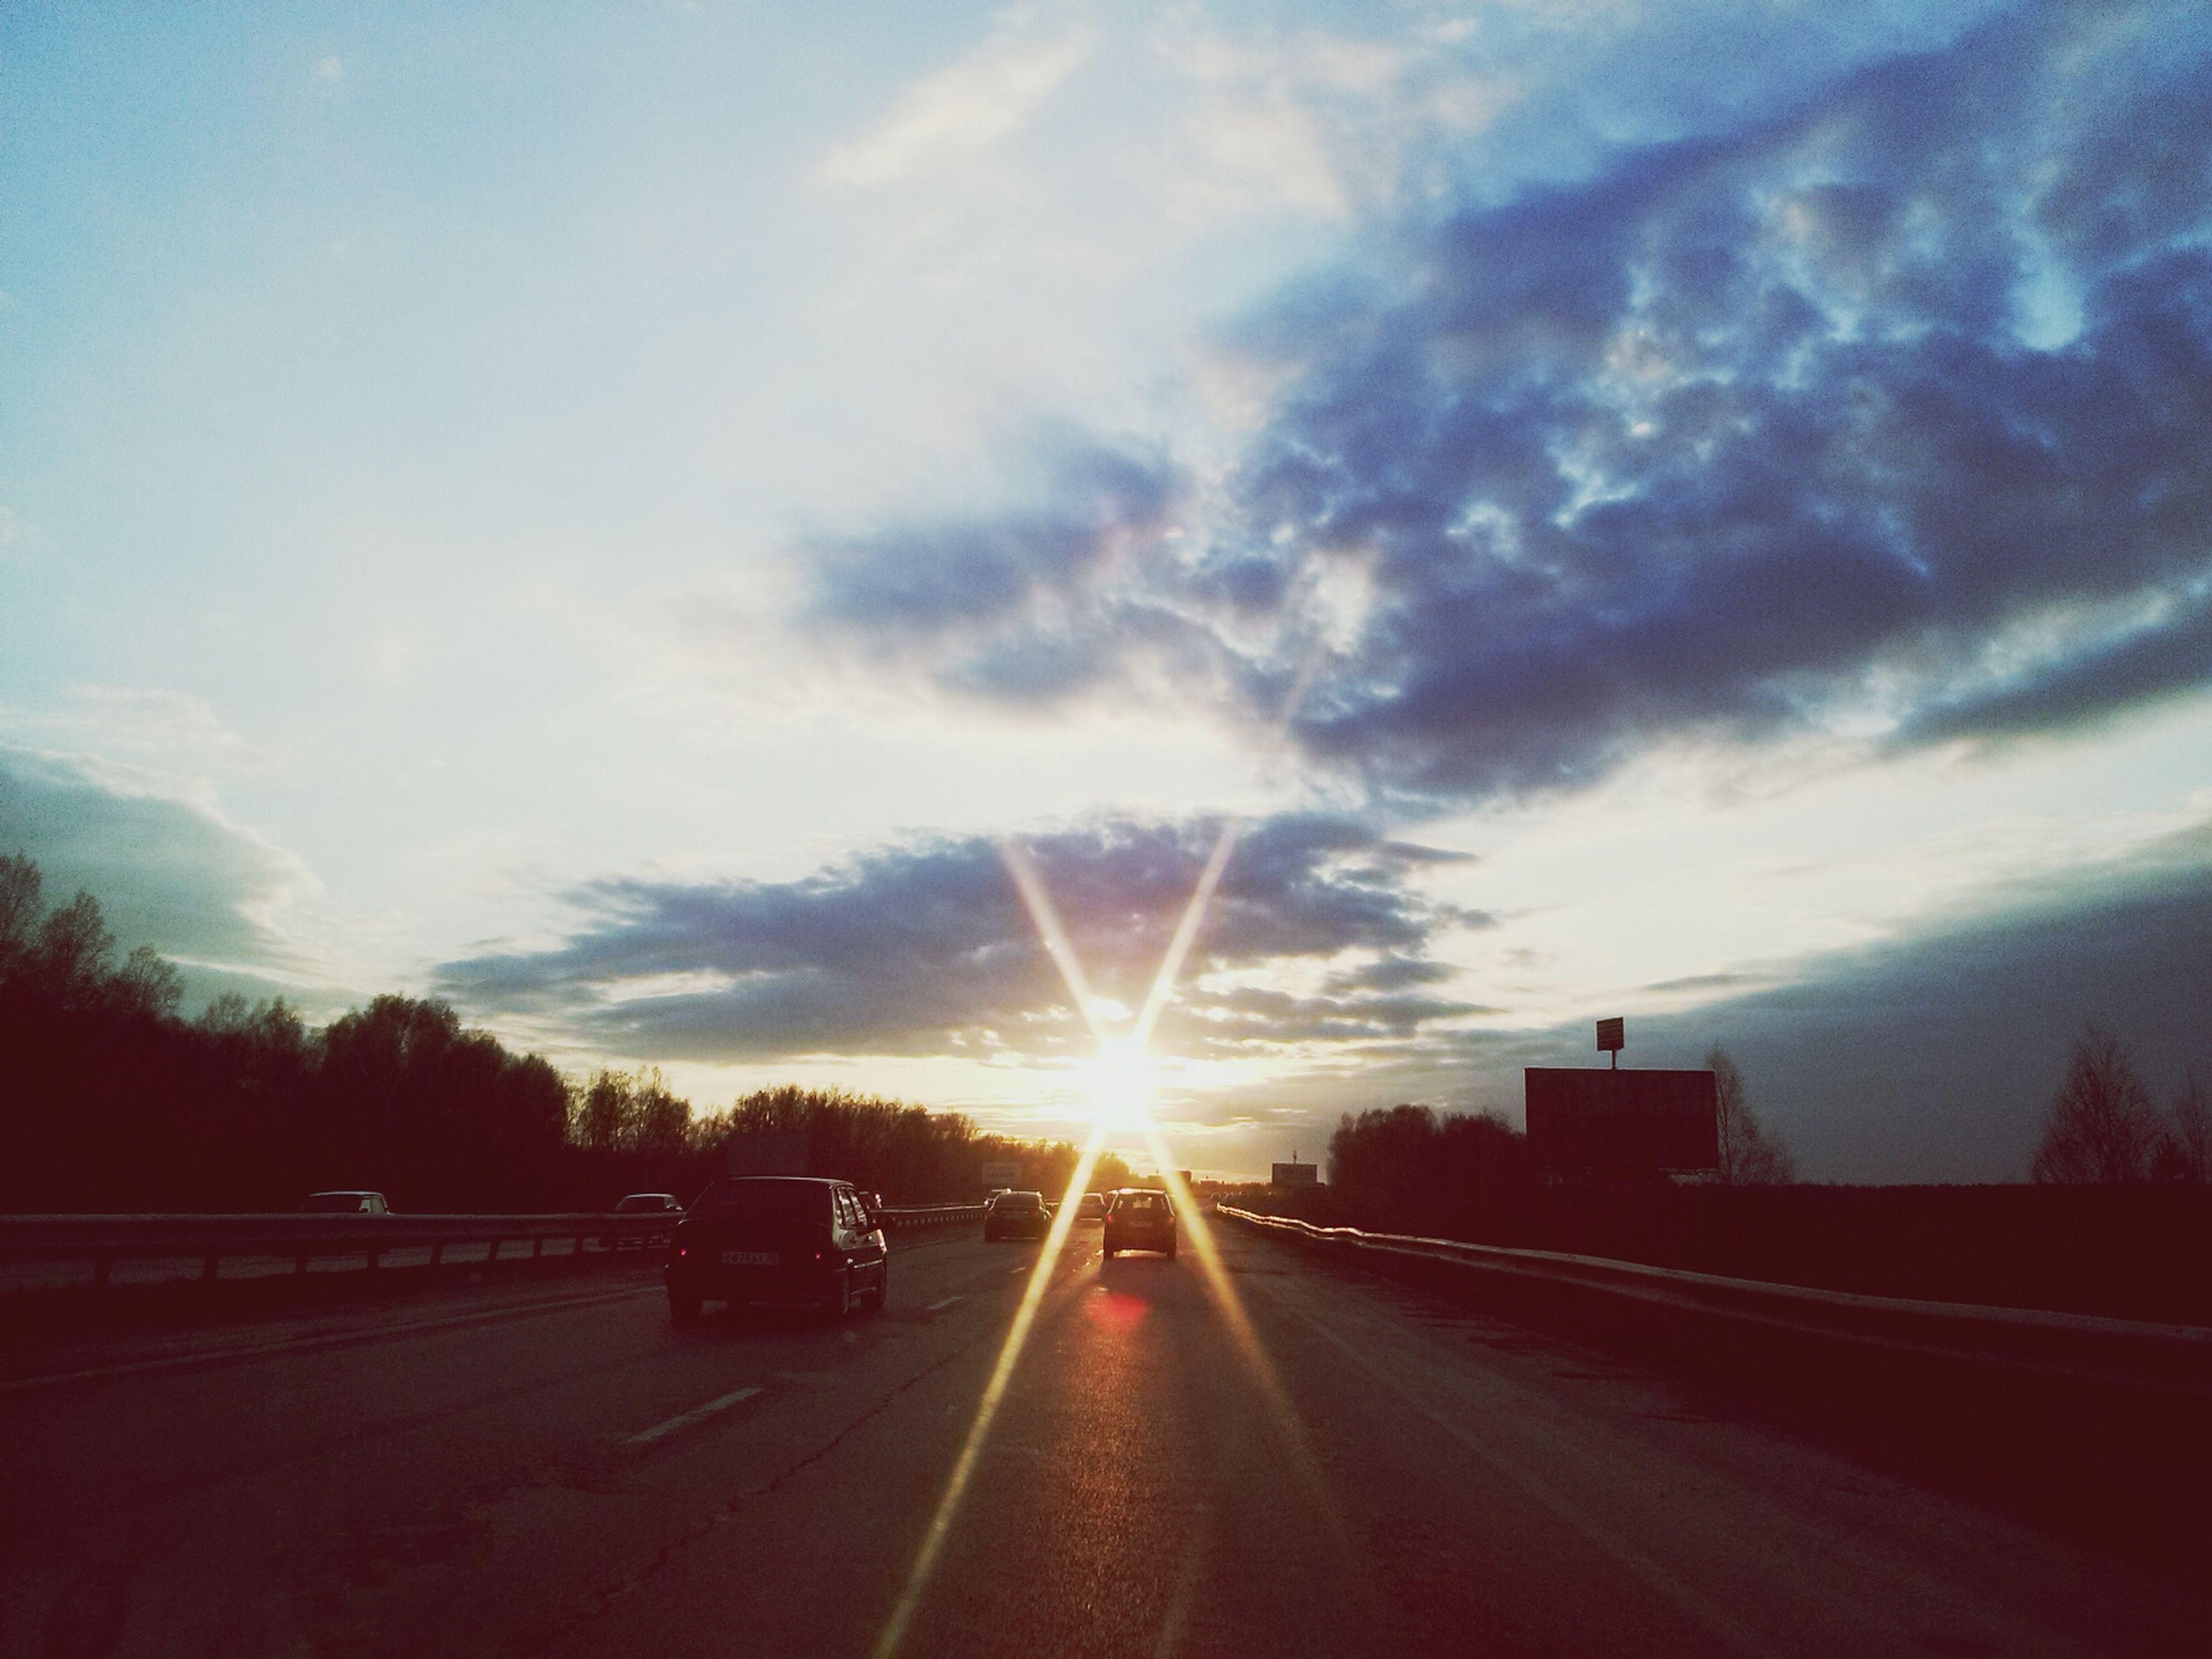 sunset, sun, sky, road, transportation, the way forward, sunbeam, cloud - sky, sunlight, diminishing perspective, vanishing point, lens flare, street, car, road marking, cloud, silhouette, nature, cloudy, outdoors